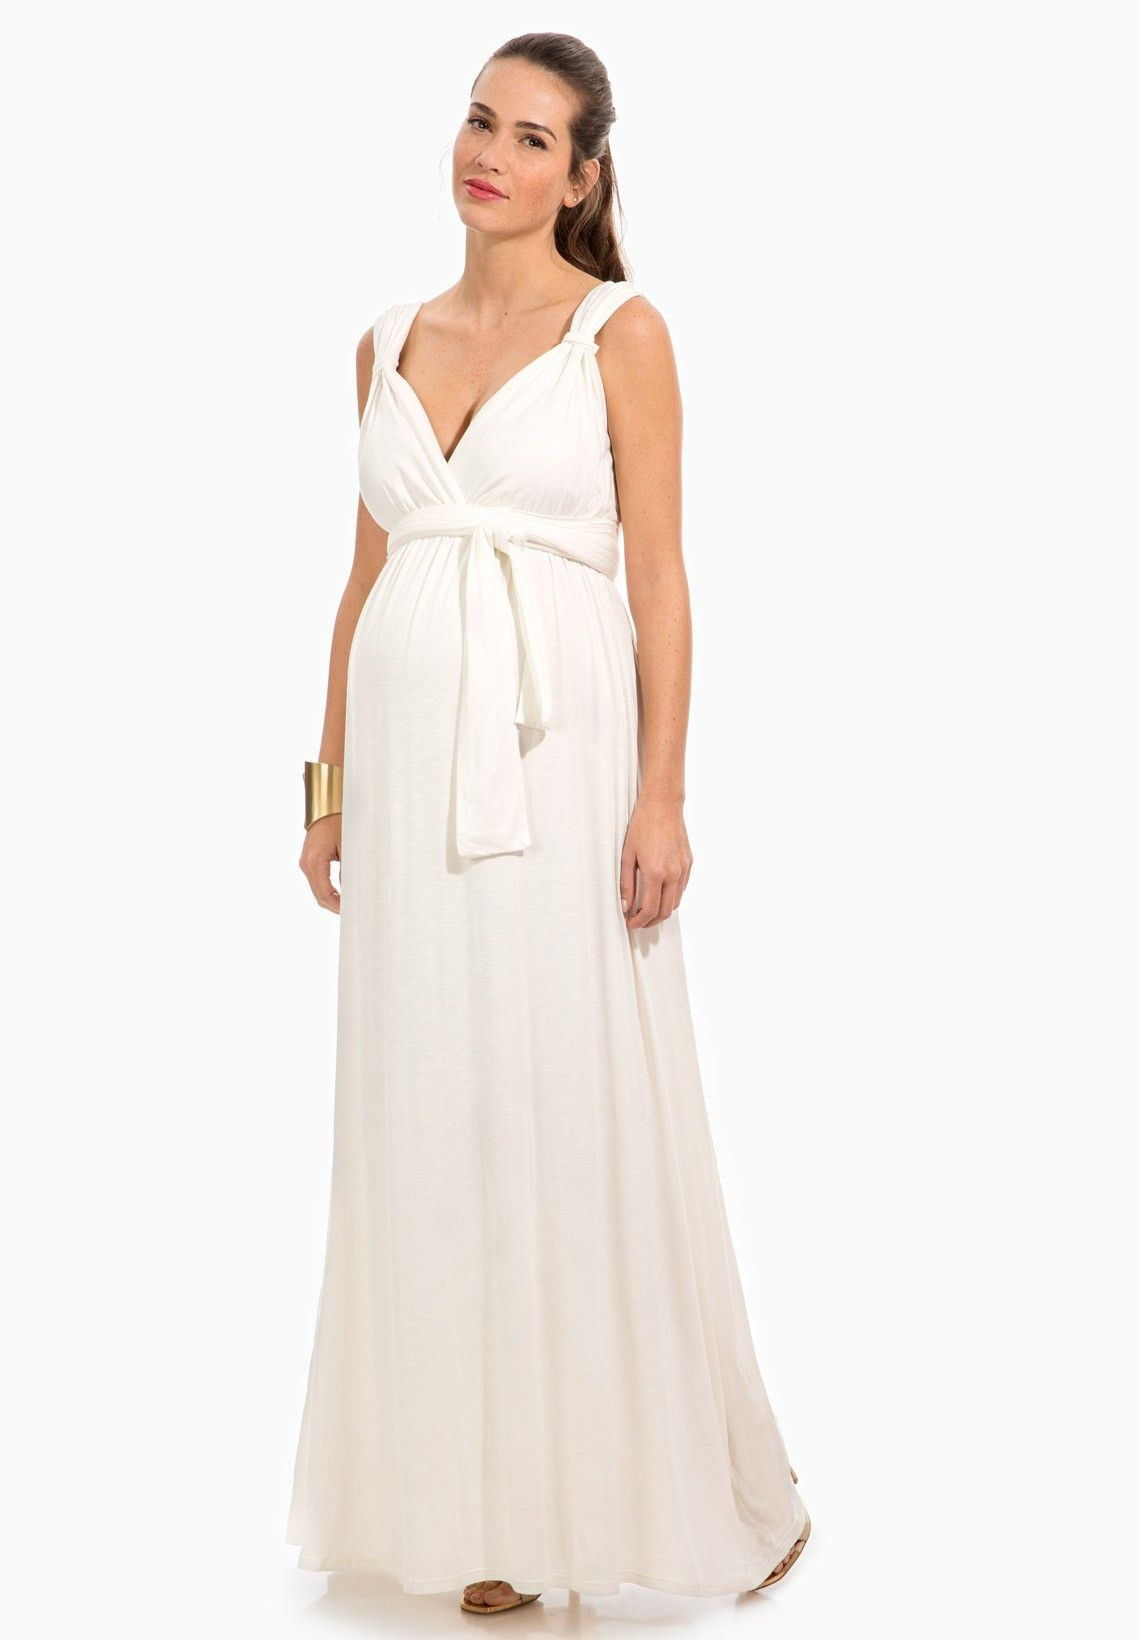 romaineflavis robe grossesse envie de fraise allaitement pinterest robe longue blanche. Black Bedroom Furniture Sets. Home Design Ideas